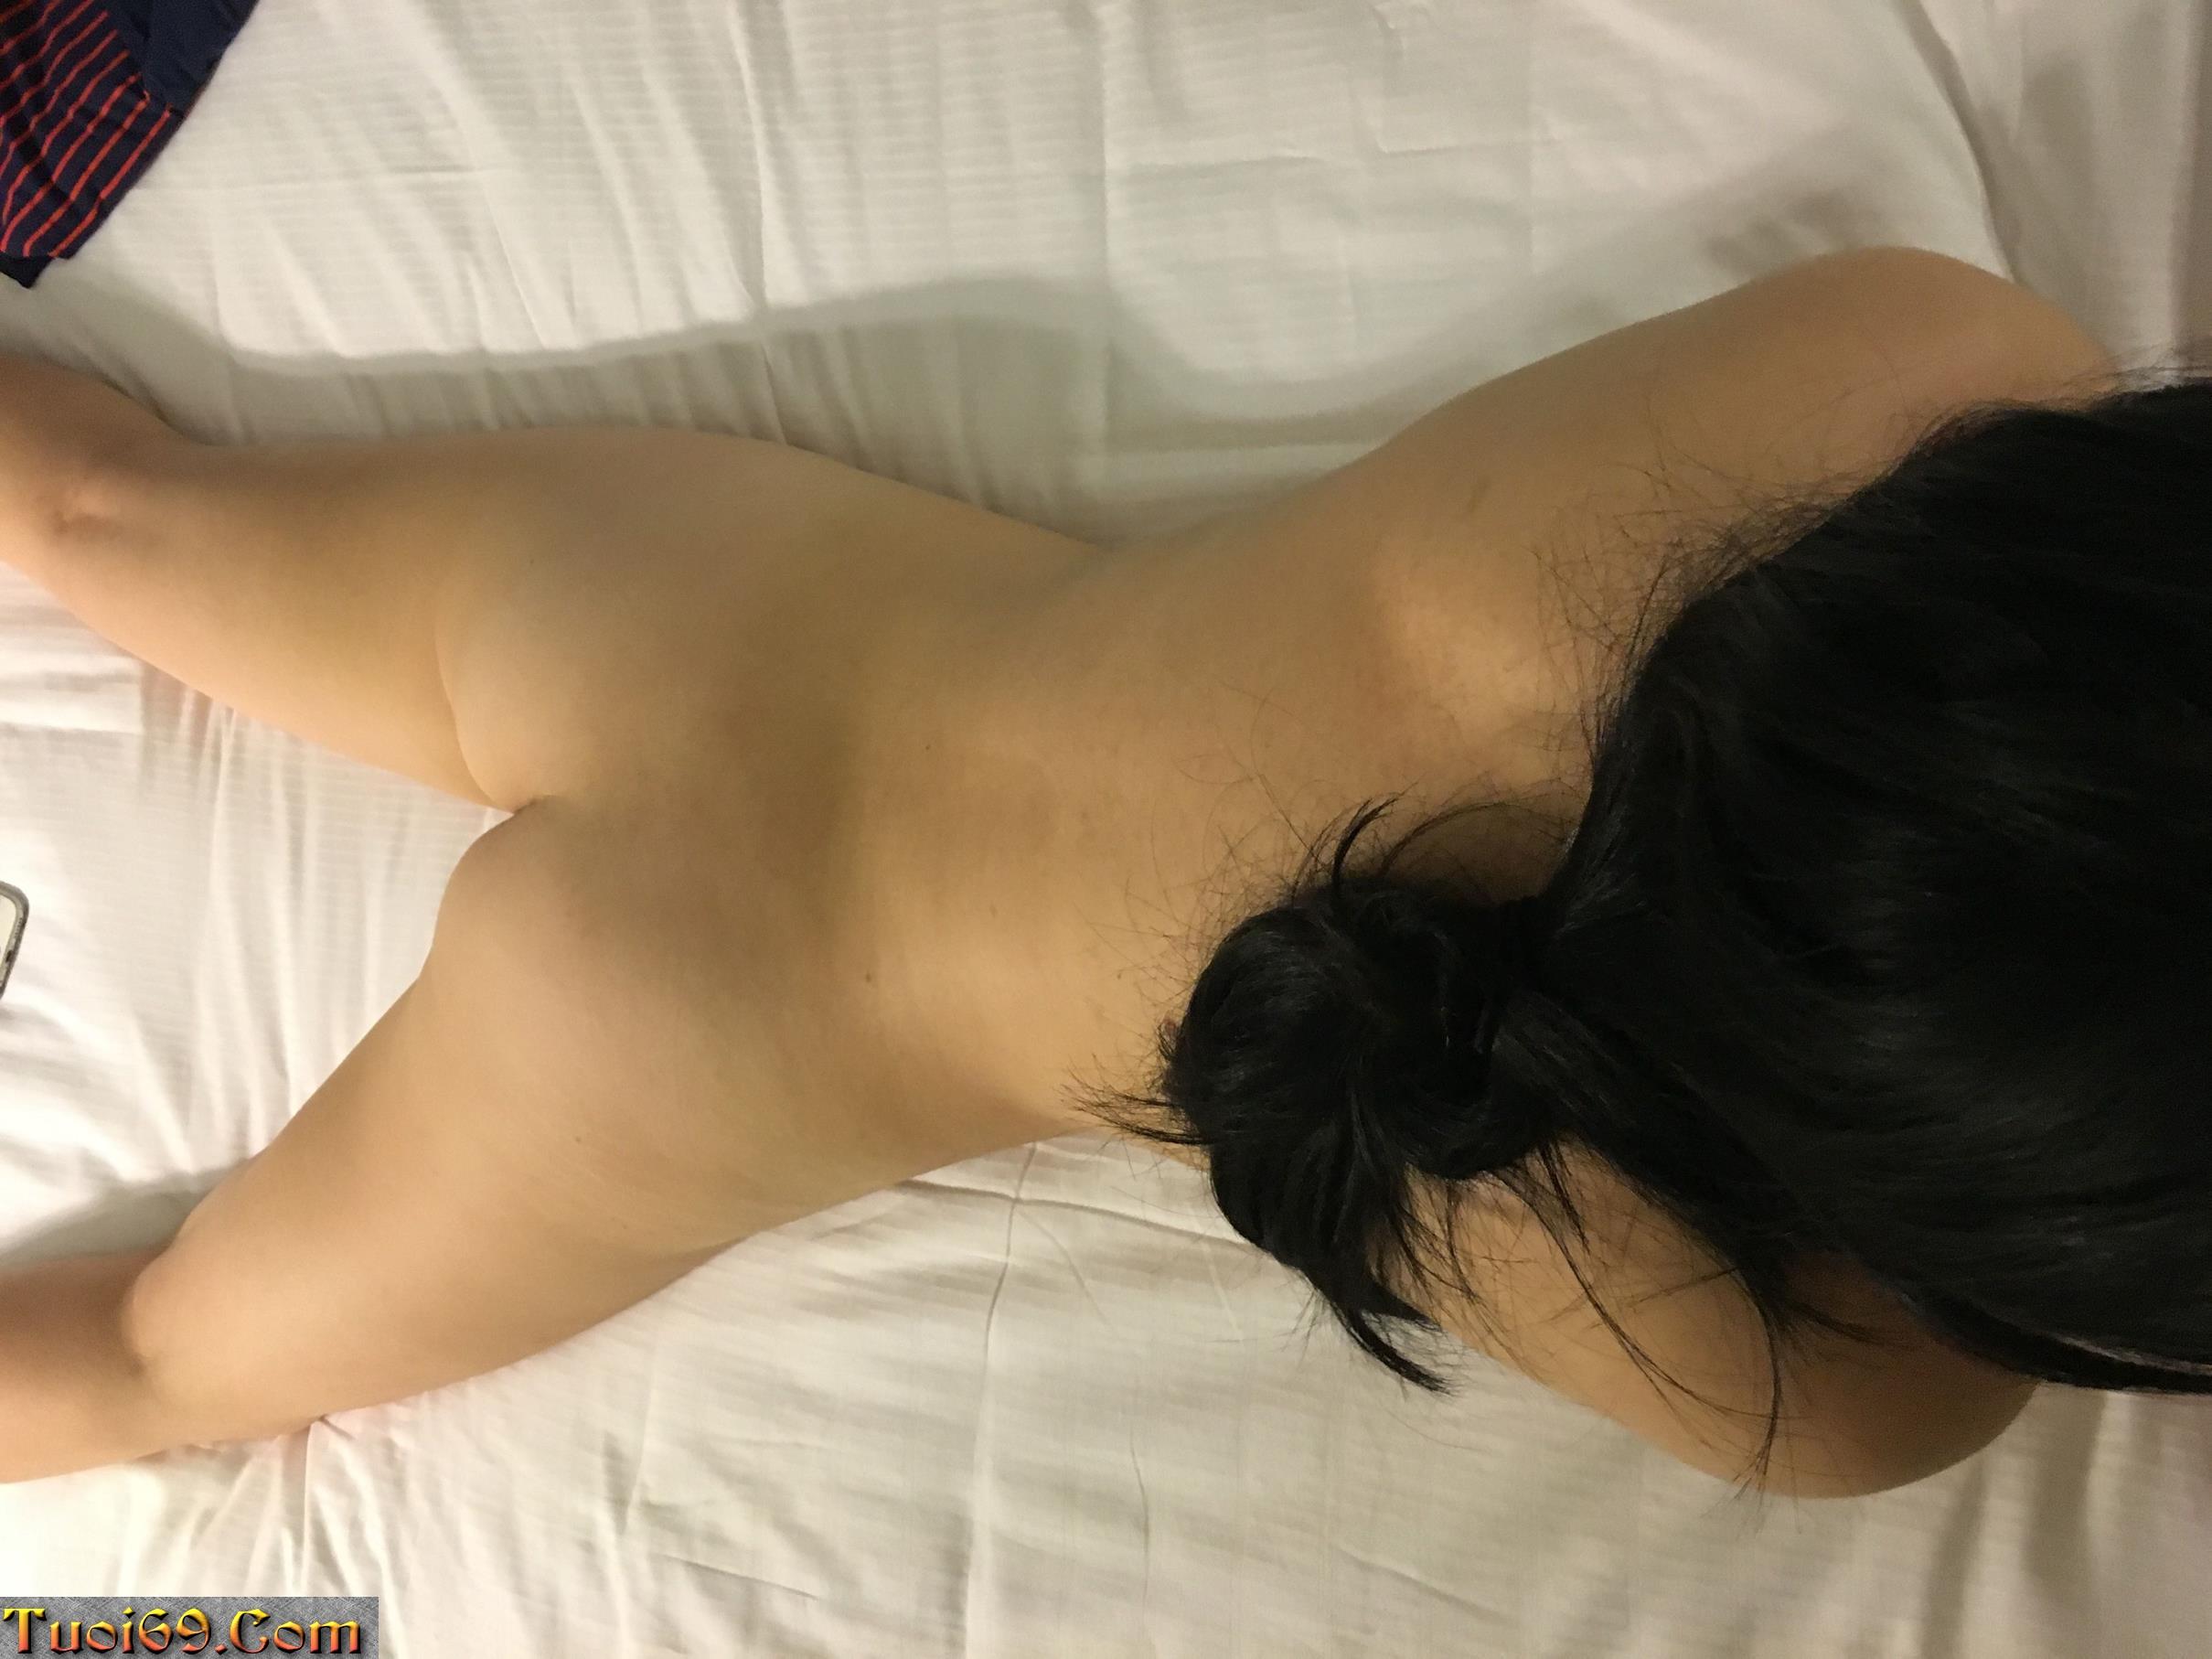 Cute-Korean-Carmen-nice-boobs-wet-pussy-masturbate-and-sex-photos-leaked-41-Copy